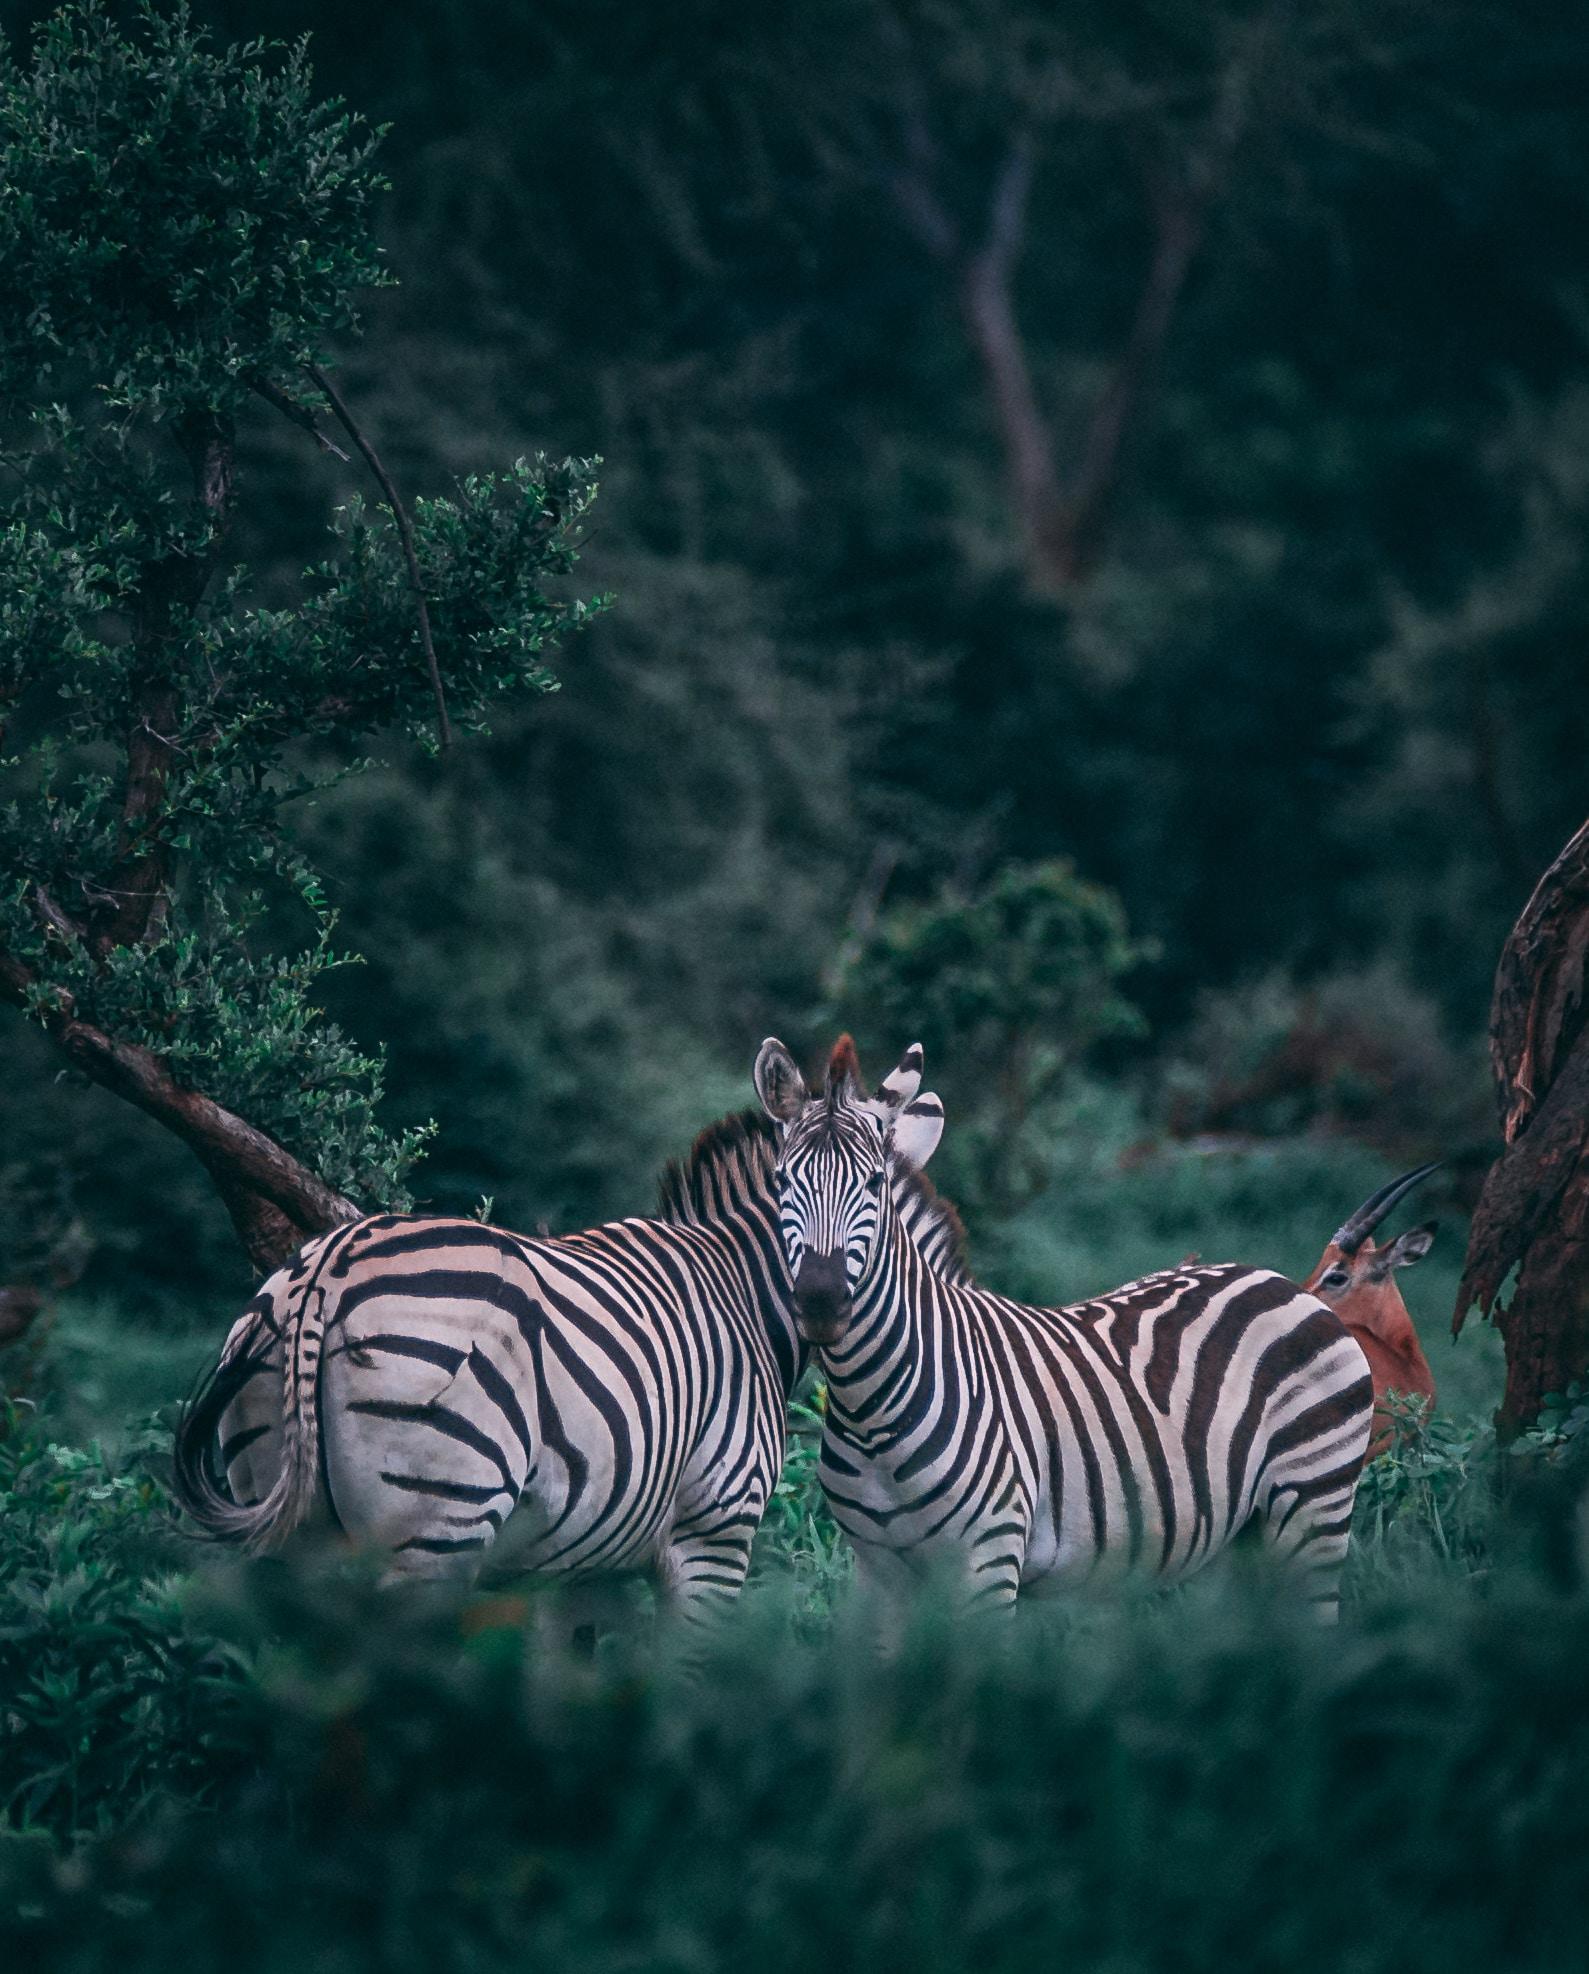 Wild like animals... love stories